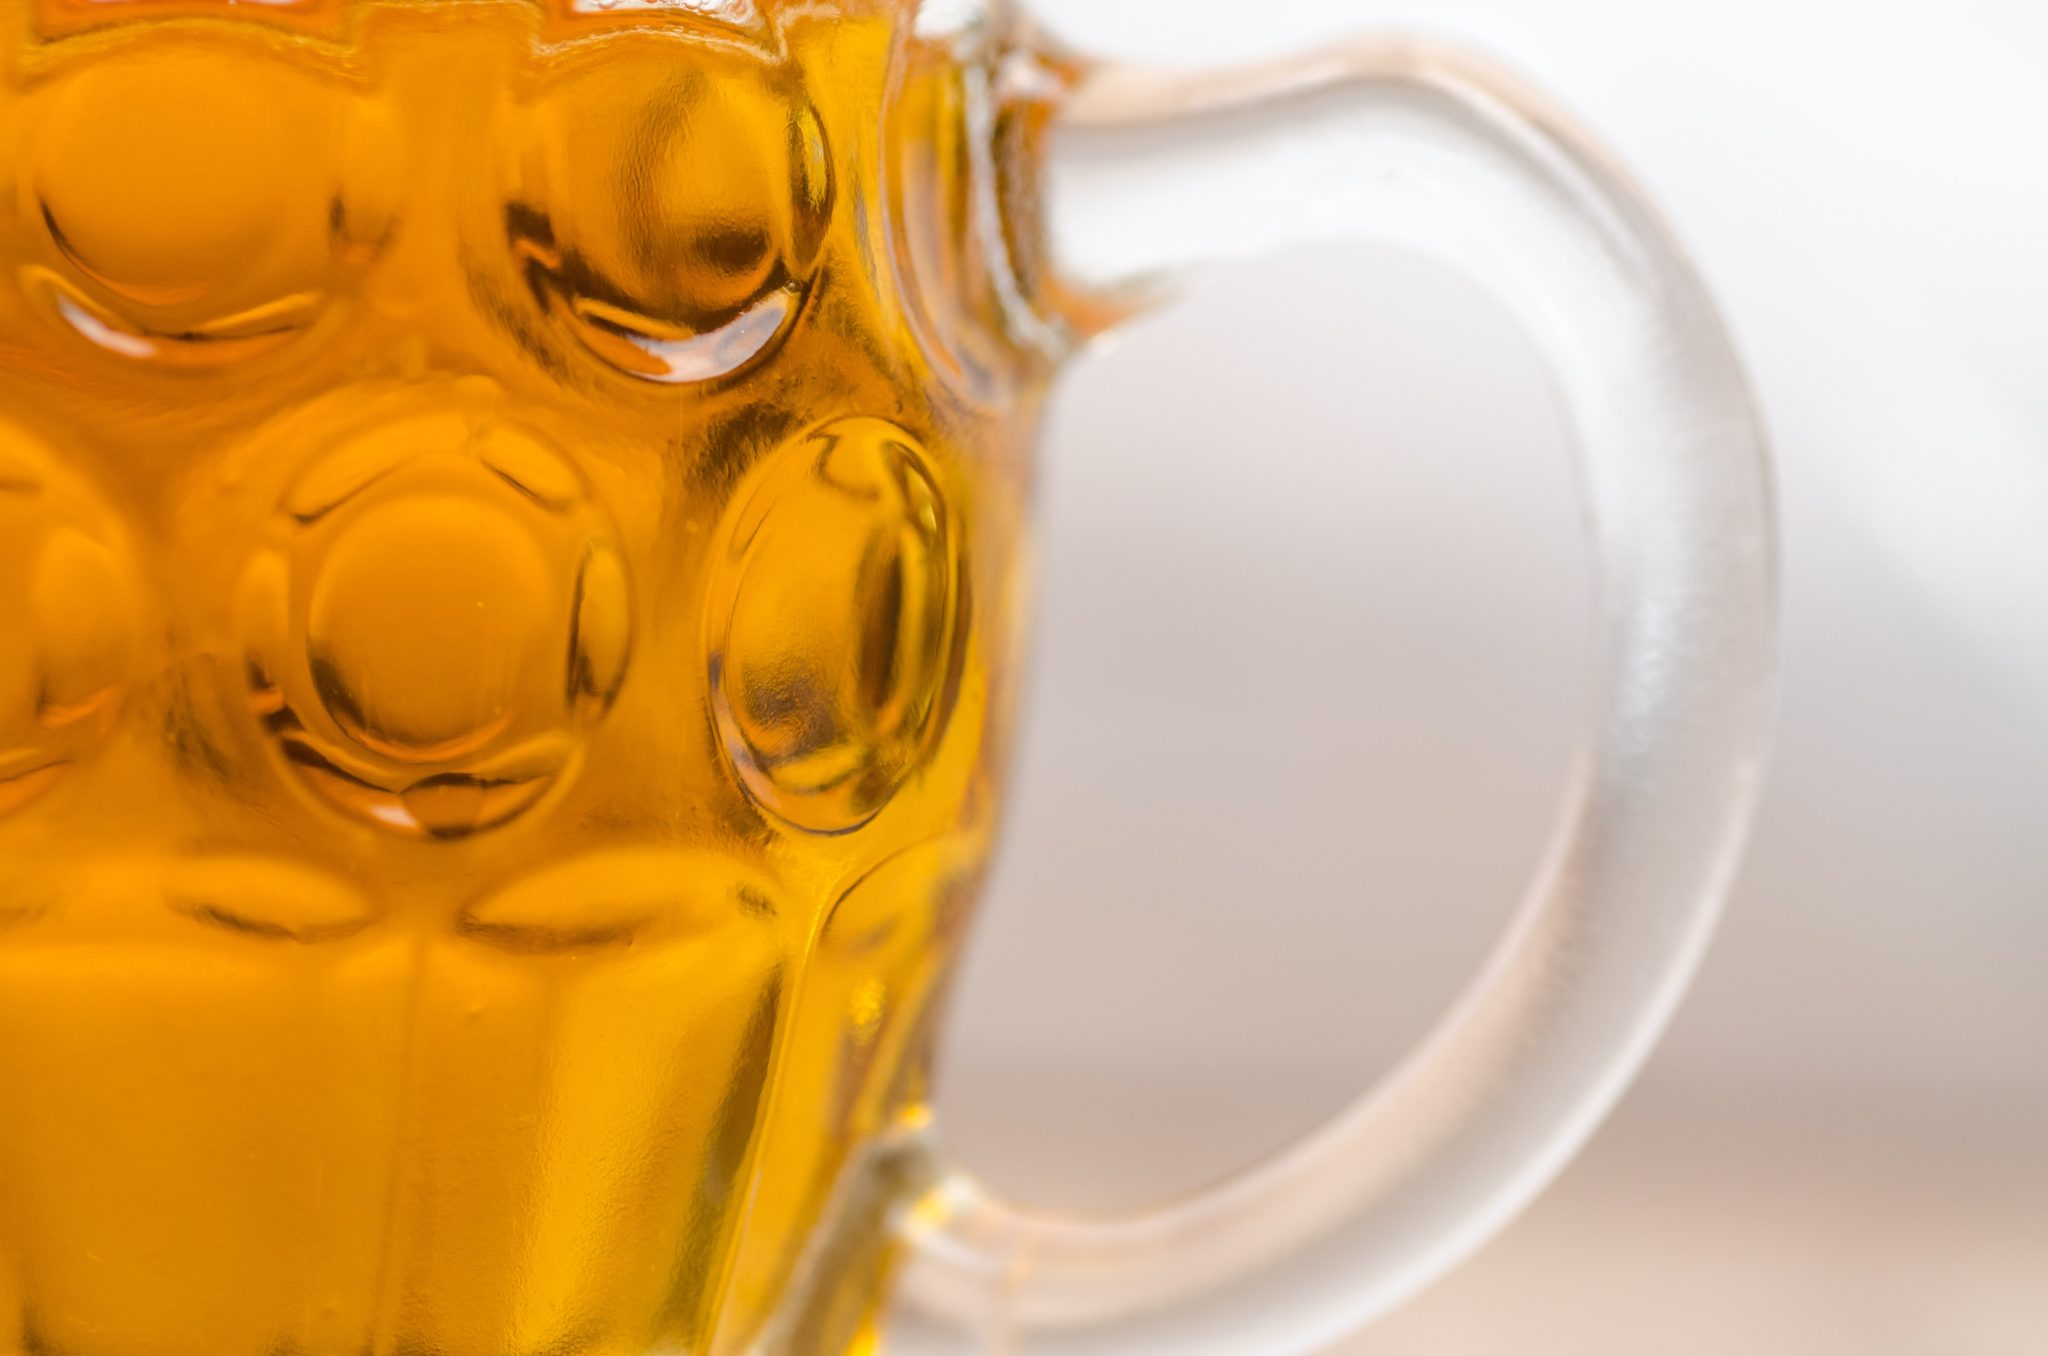 anse verre a biere brassage